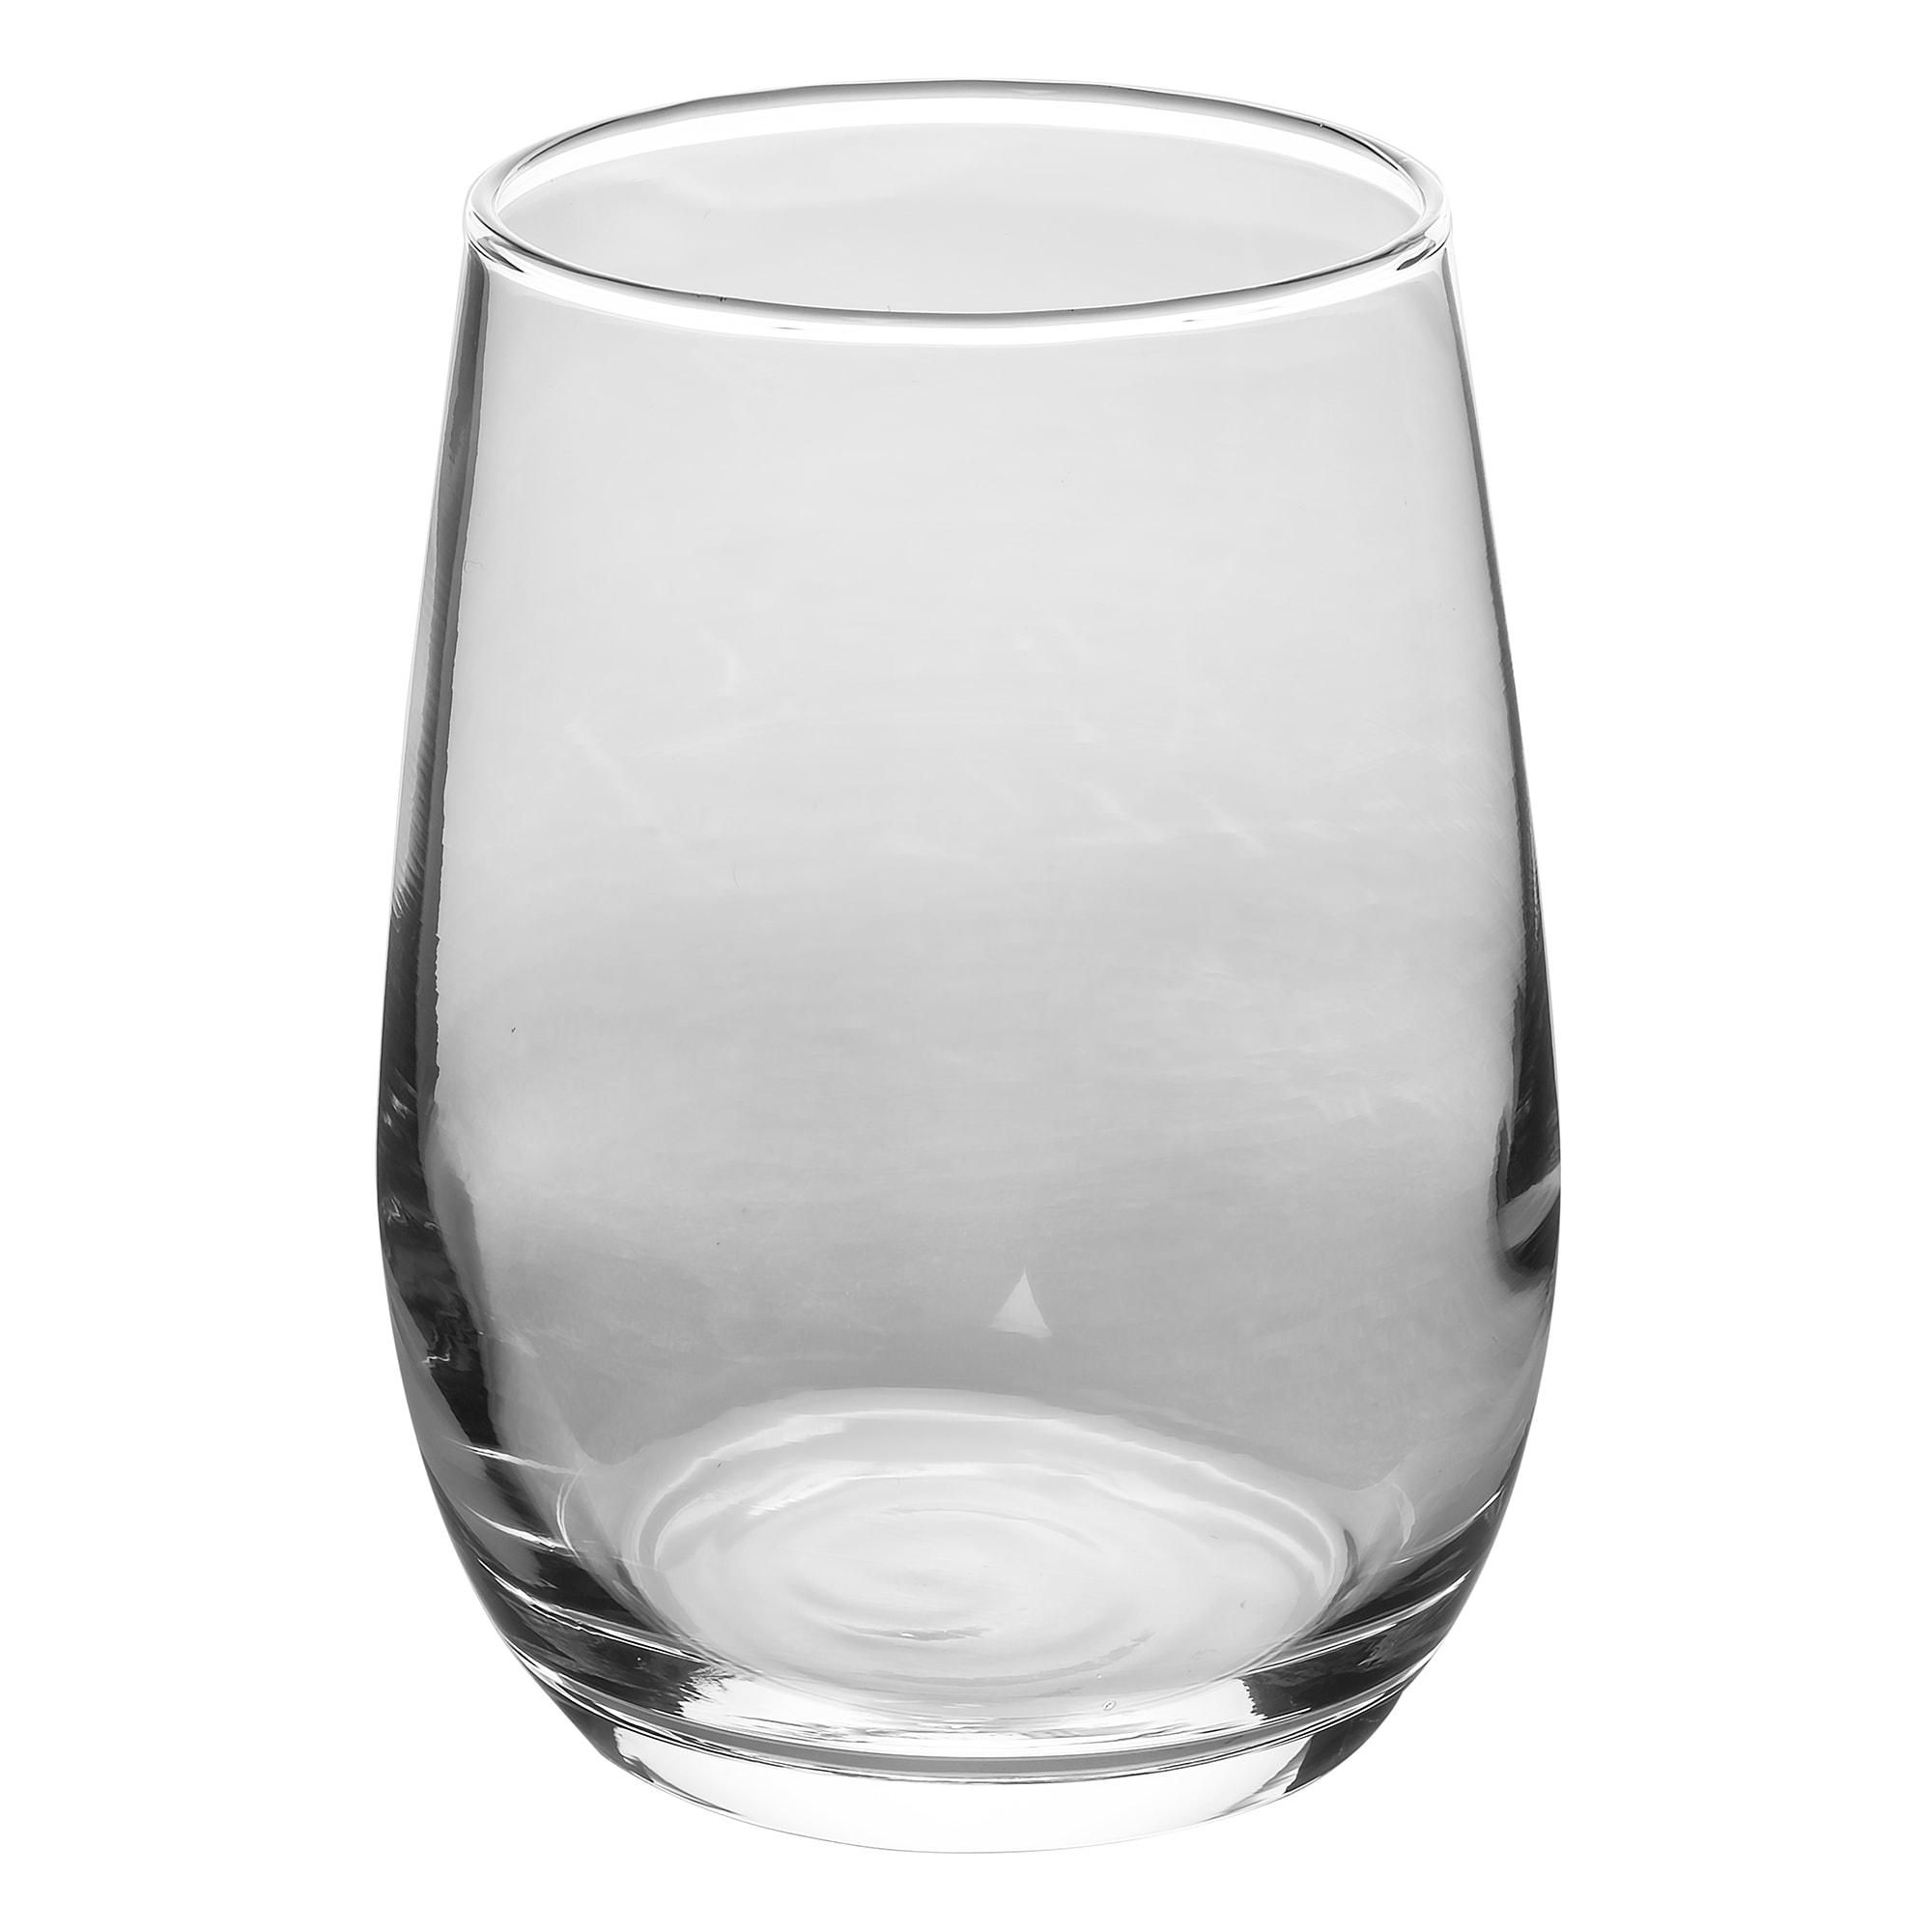 Libbey 260 6-1/4-oz Safedge Wine Taster Glass - Rim Guarantee, Clear